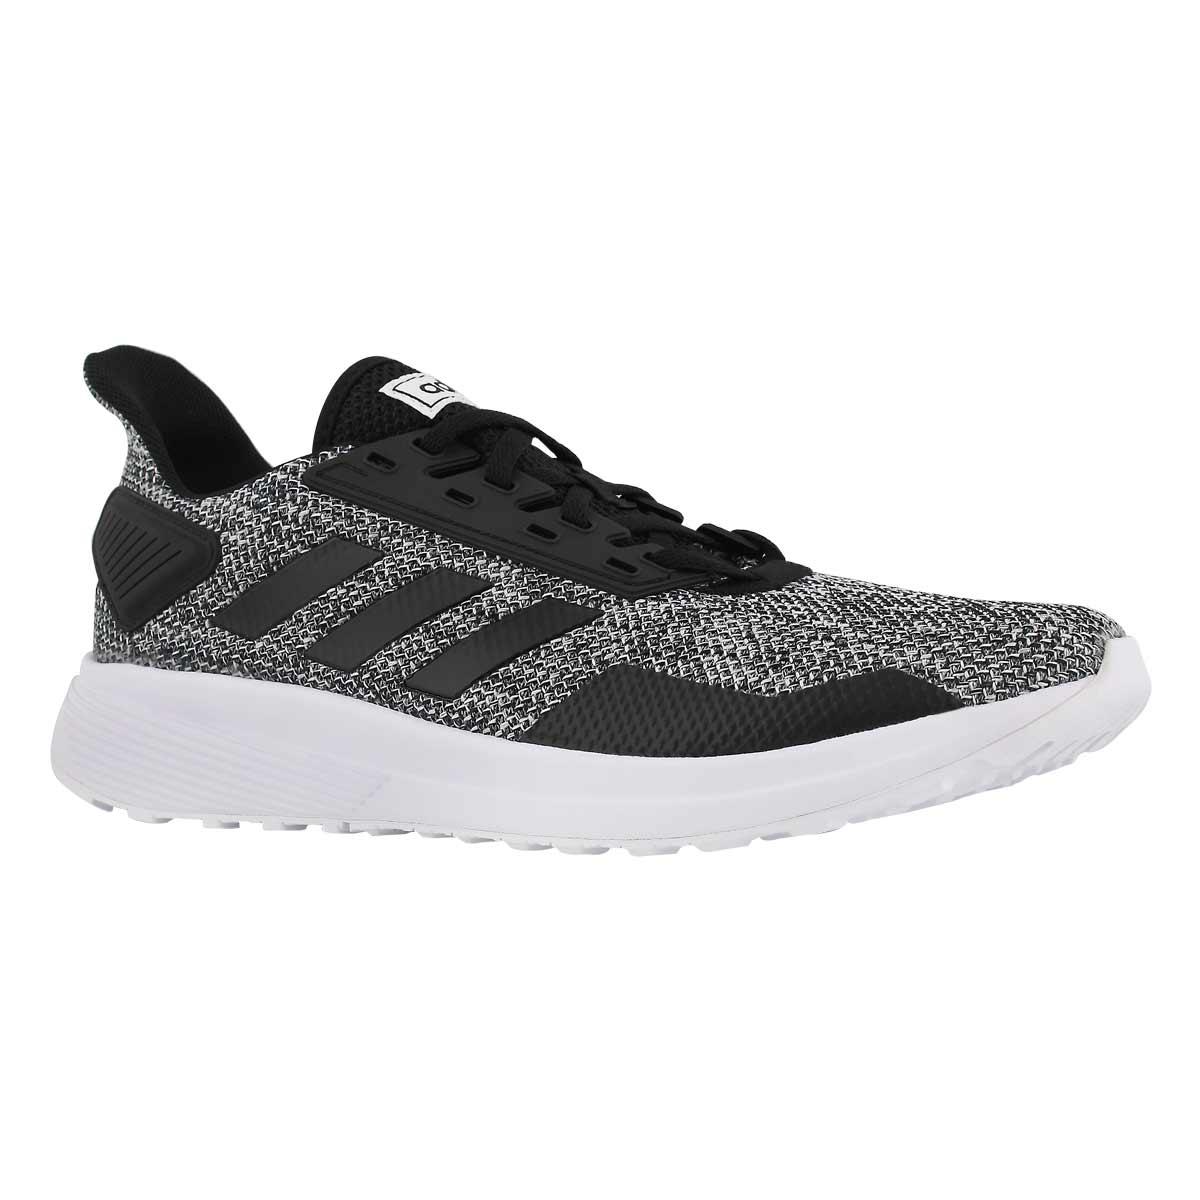 Mns Duramo 9 black running shoe